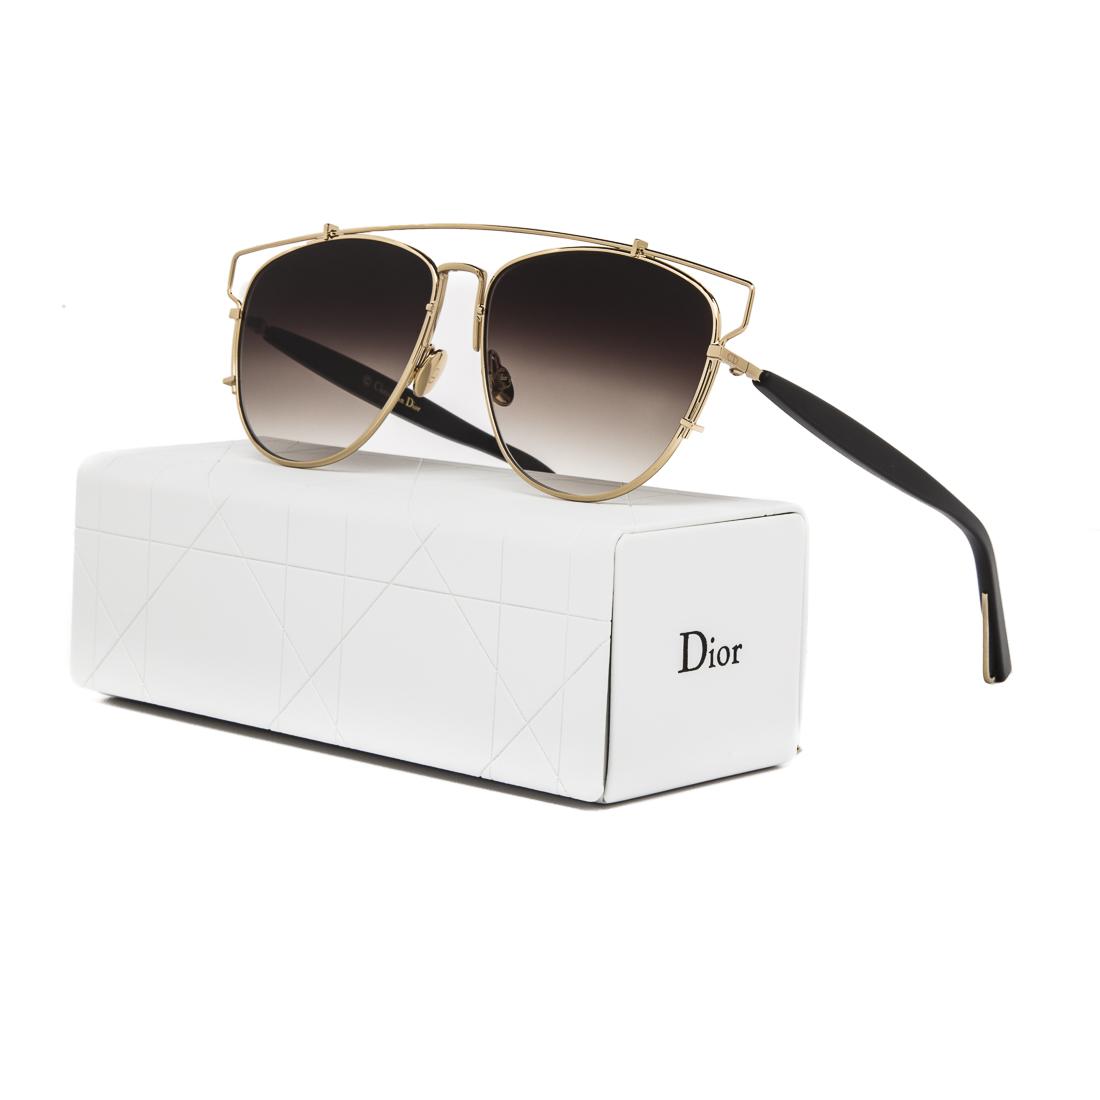 b195e0e98ca6 ... www.lesbauxdeprovence.com dior sunglasses